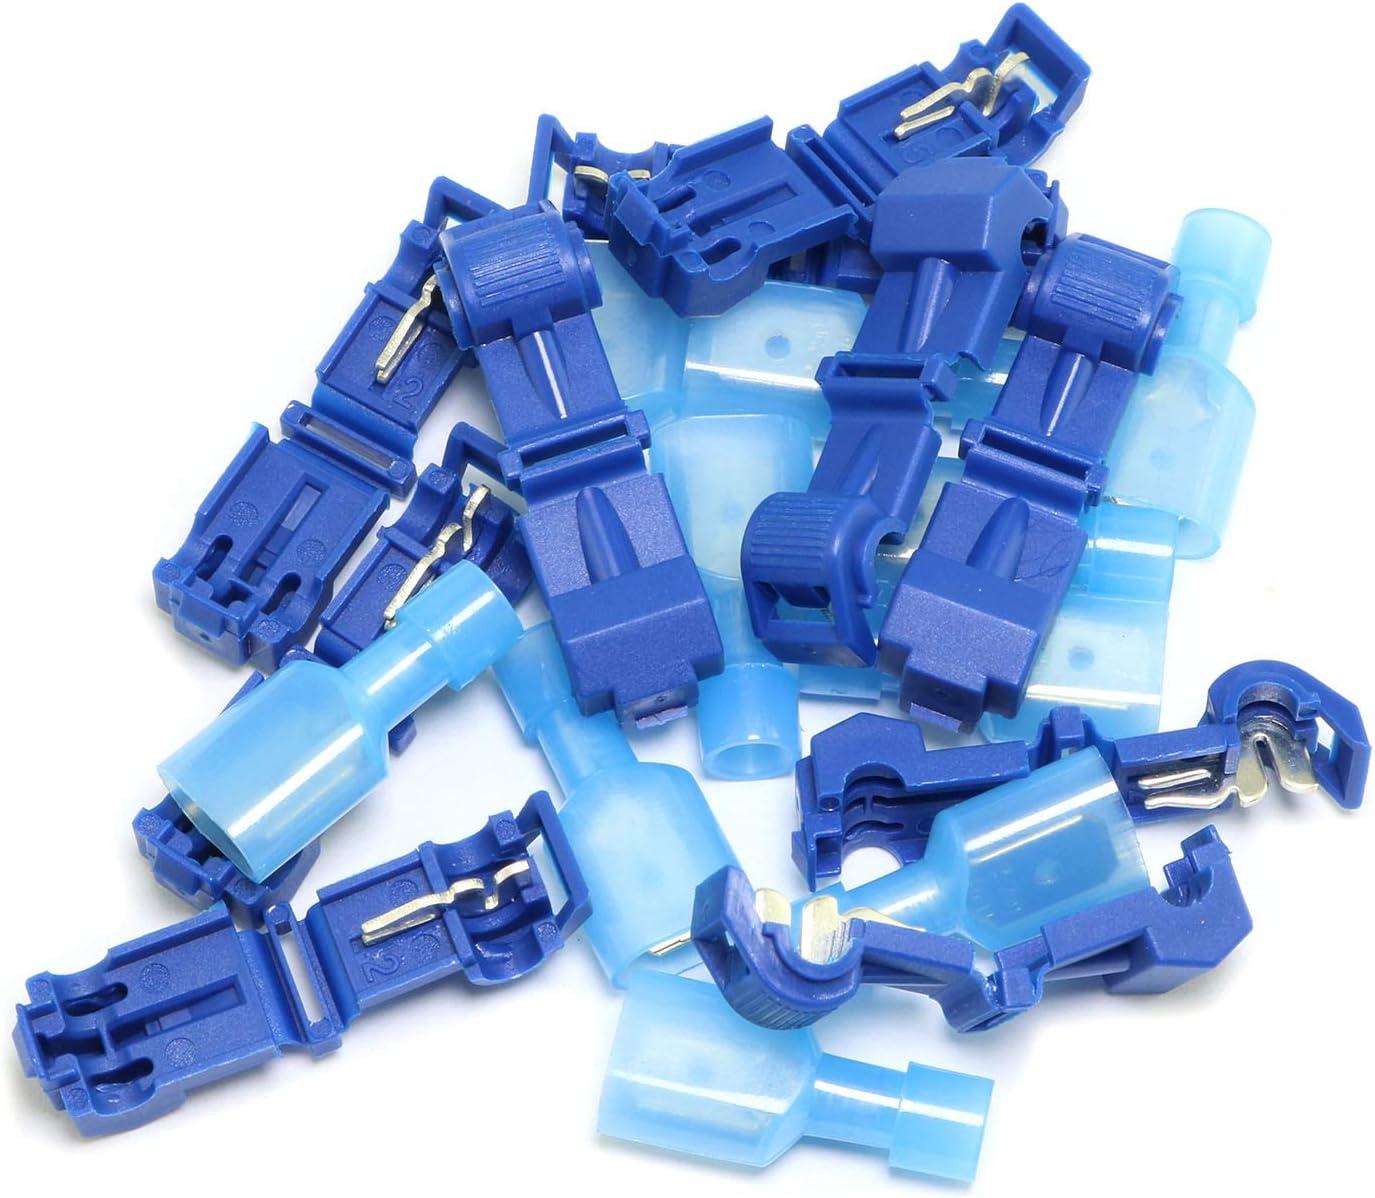 Partstock 60PCS Quick Splice Electric Wire Terminals Connectors Self-Stripping Electrical T Tap Connector Set Crimp Assortment Kits